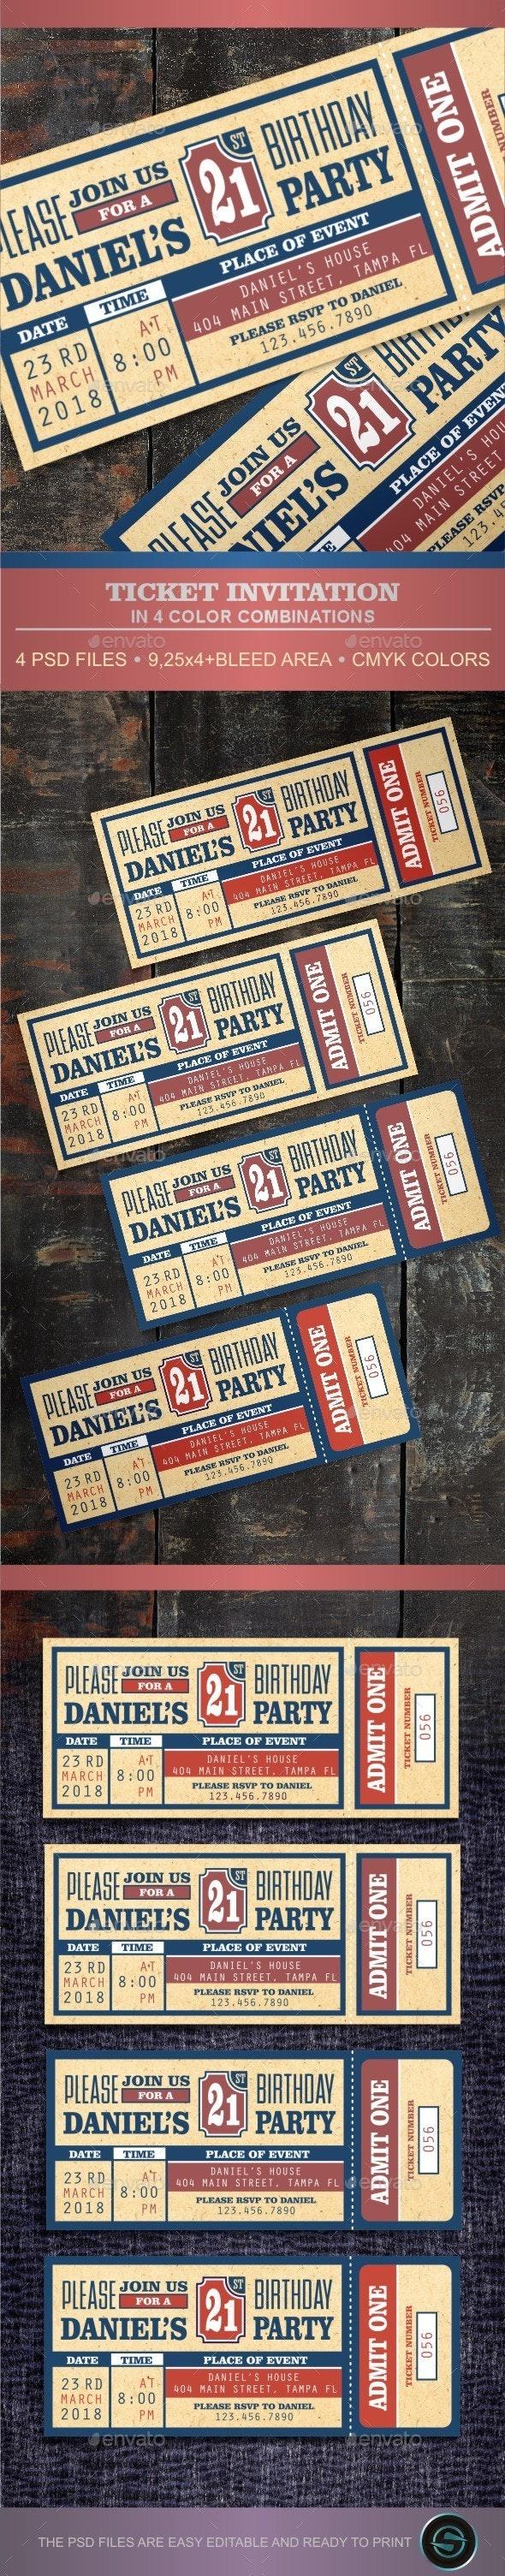 Ticket Invitation - Invitations Cards & Invites